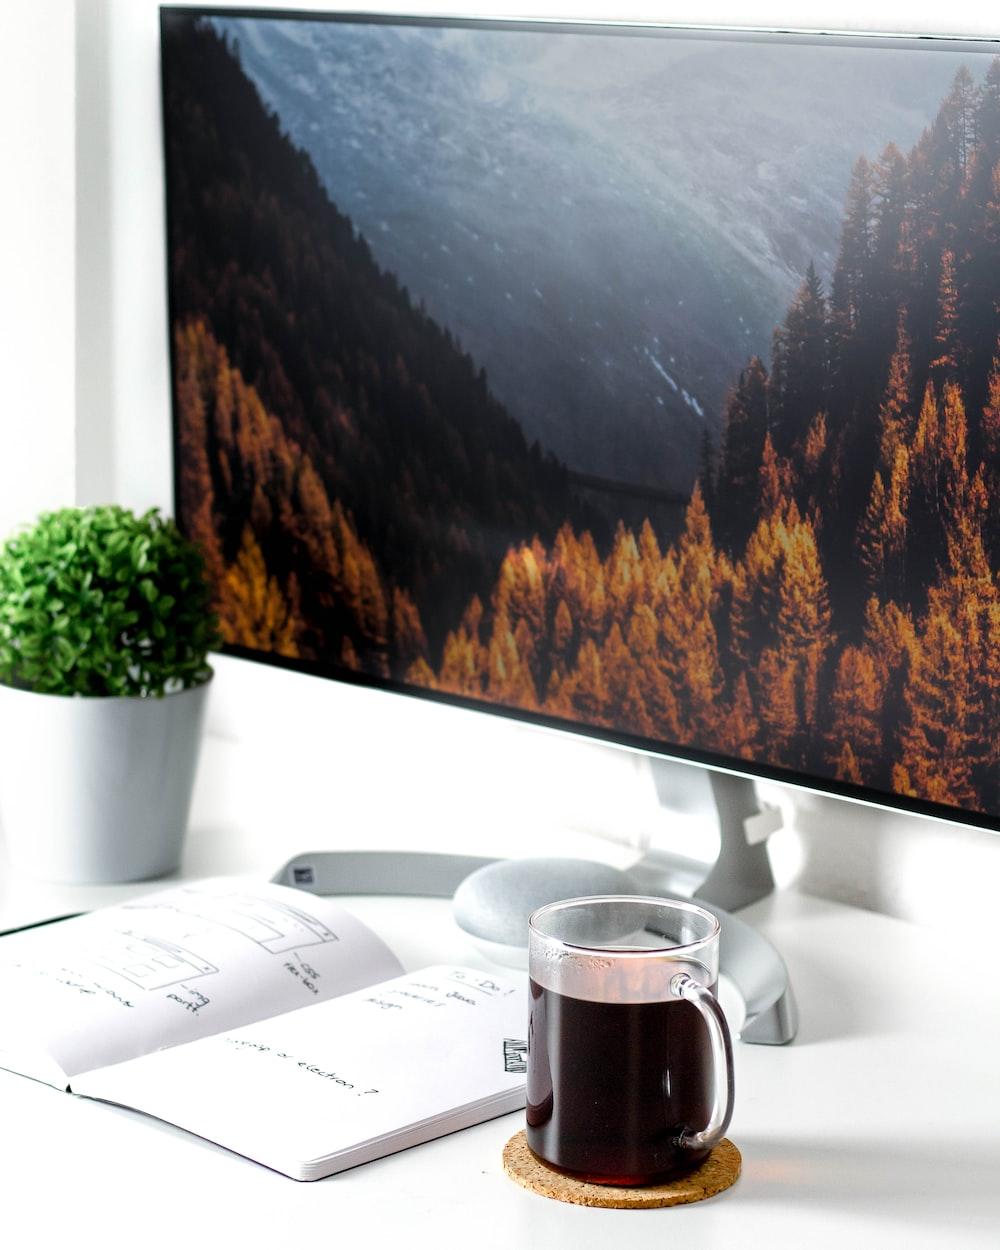 flat screen monitor on desk